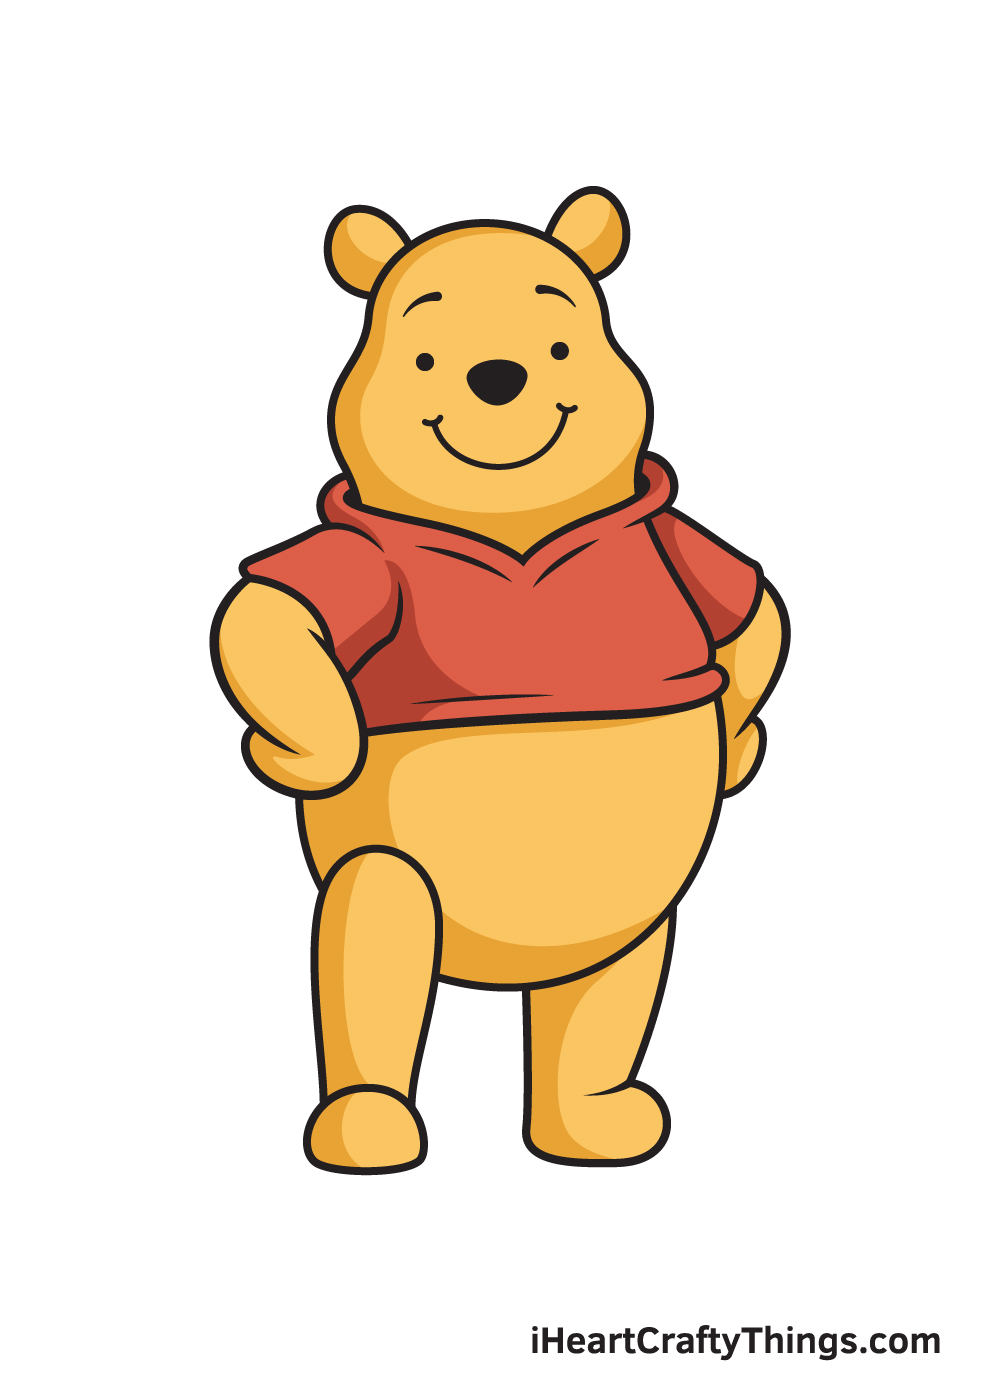 winnie the pooh drawing 9 steps